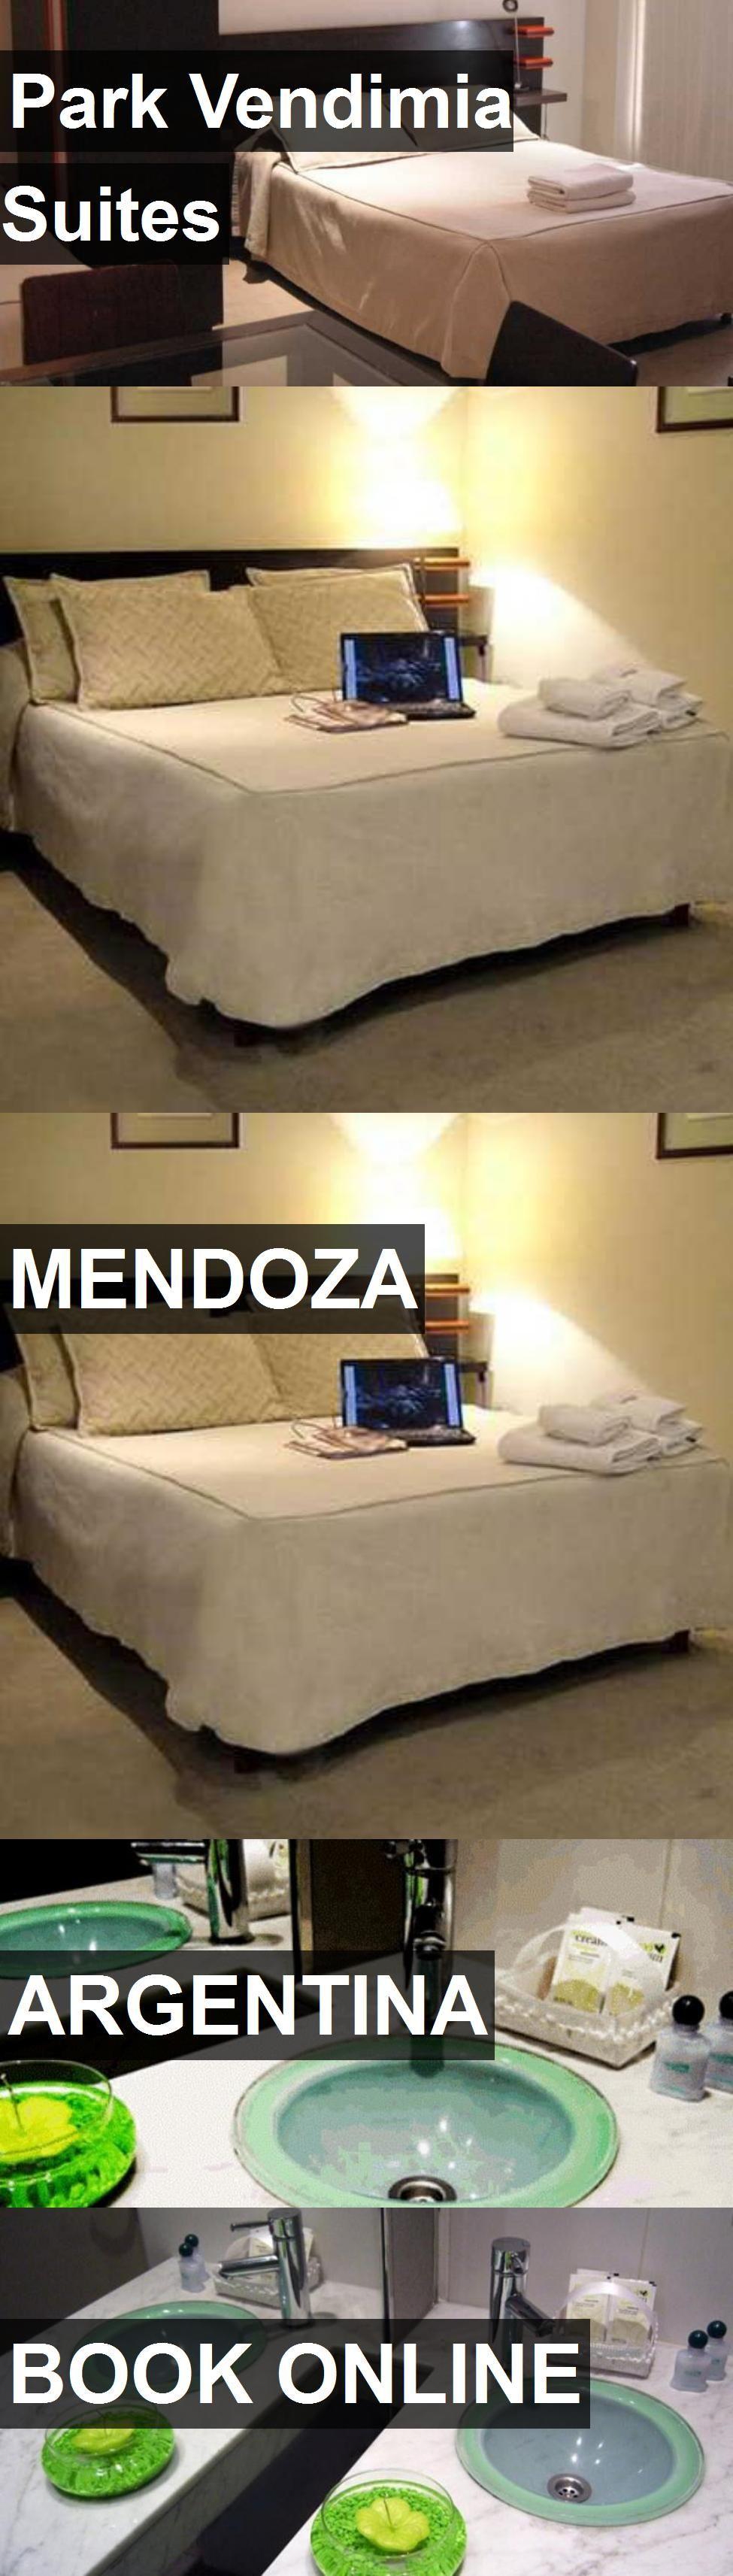 Fiesta Nacional De La Vendimia Mendoza 2014 Vendimia Mendoza  # Muebles Tio Ernesto